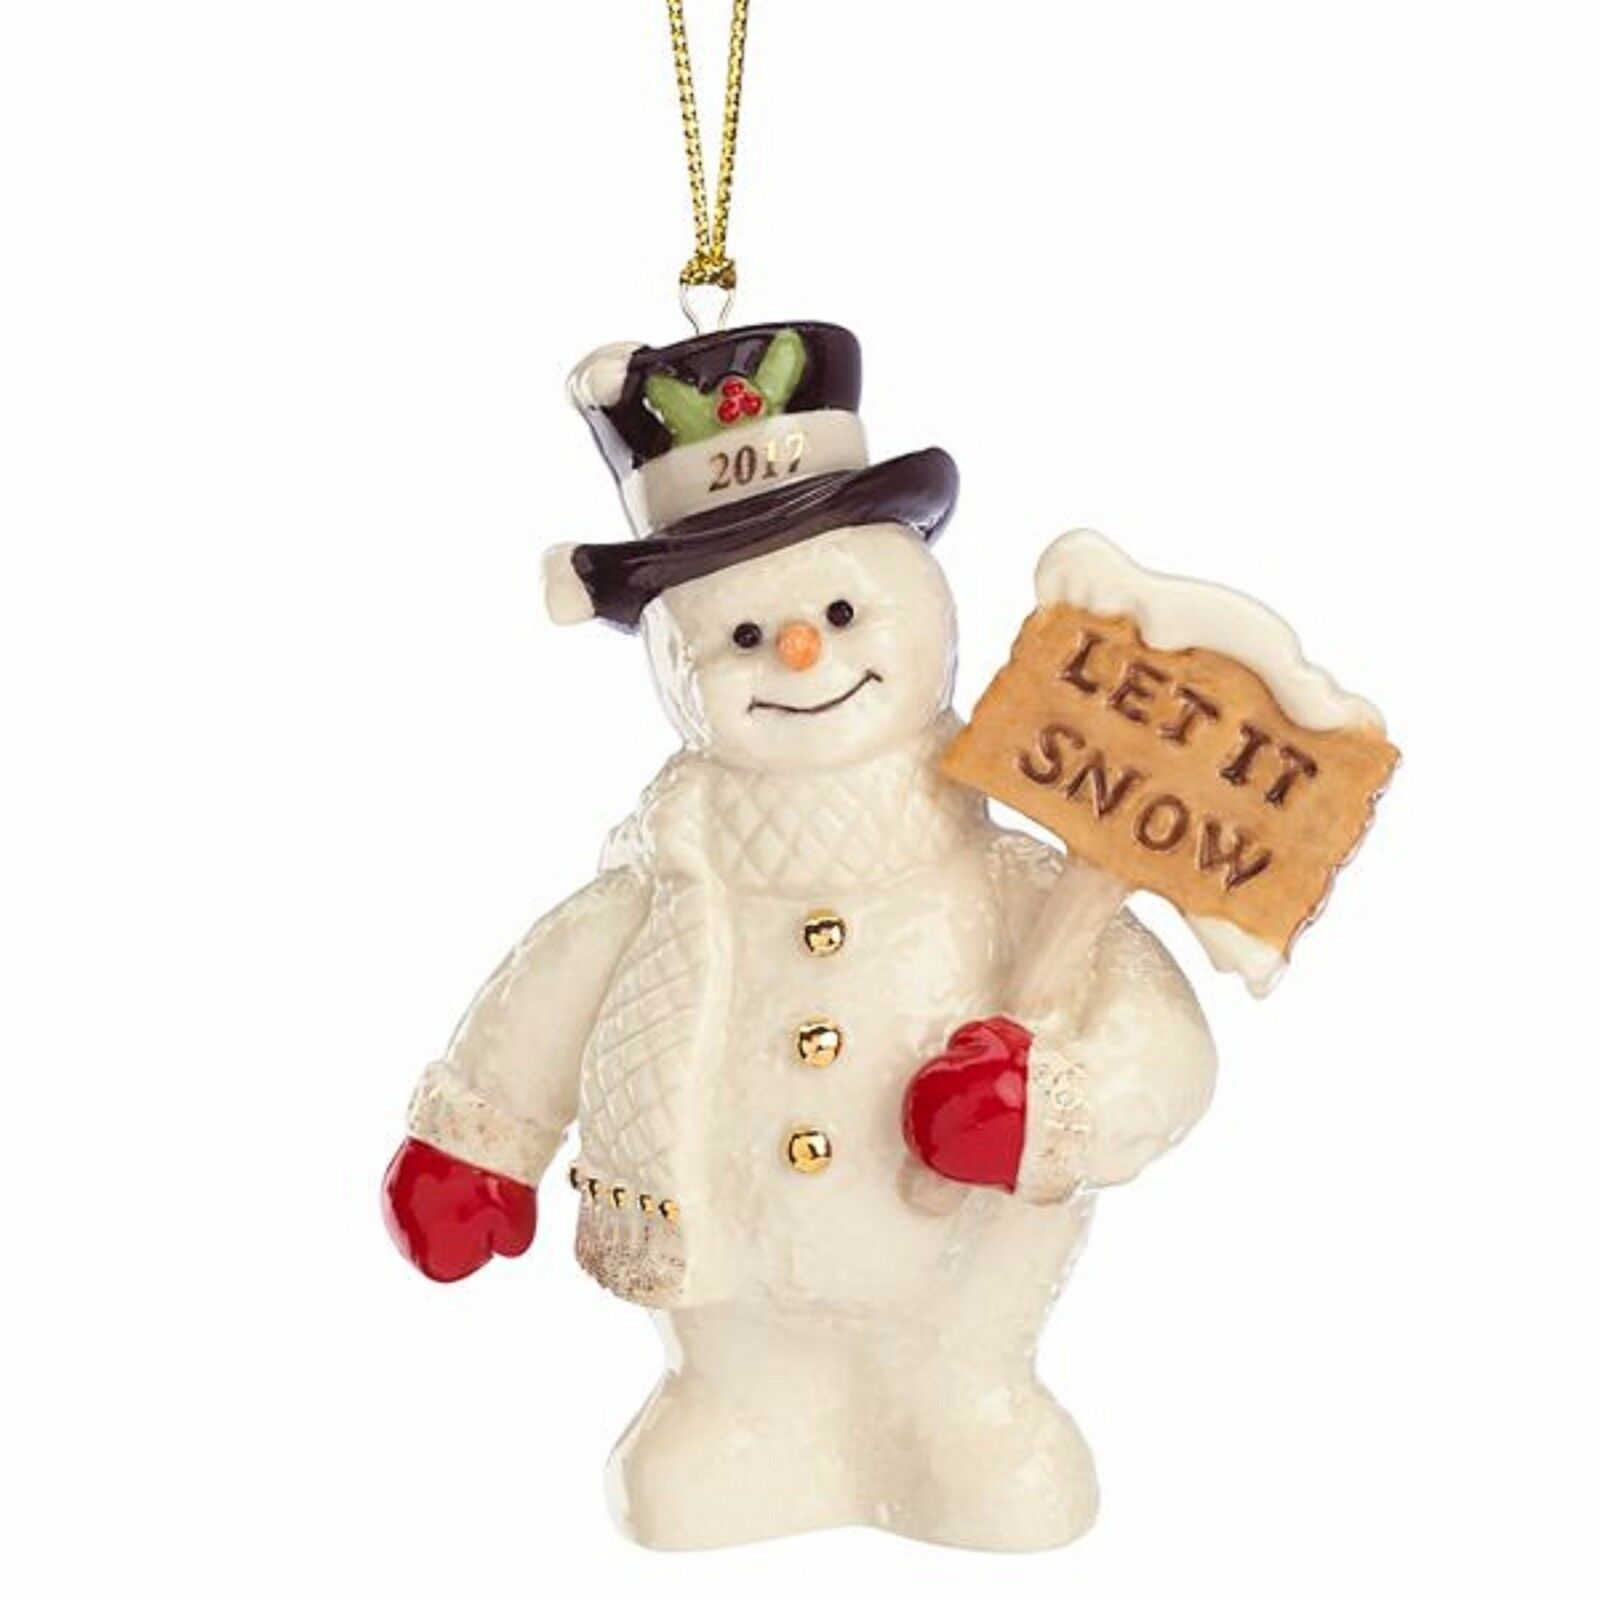 Lenox 2017 Snowman Figurine Ornament Annual Let It Snow Christmas Gift NEW